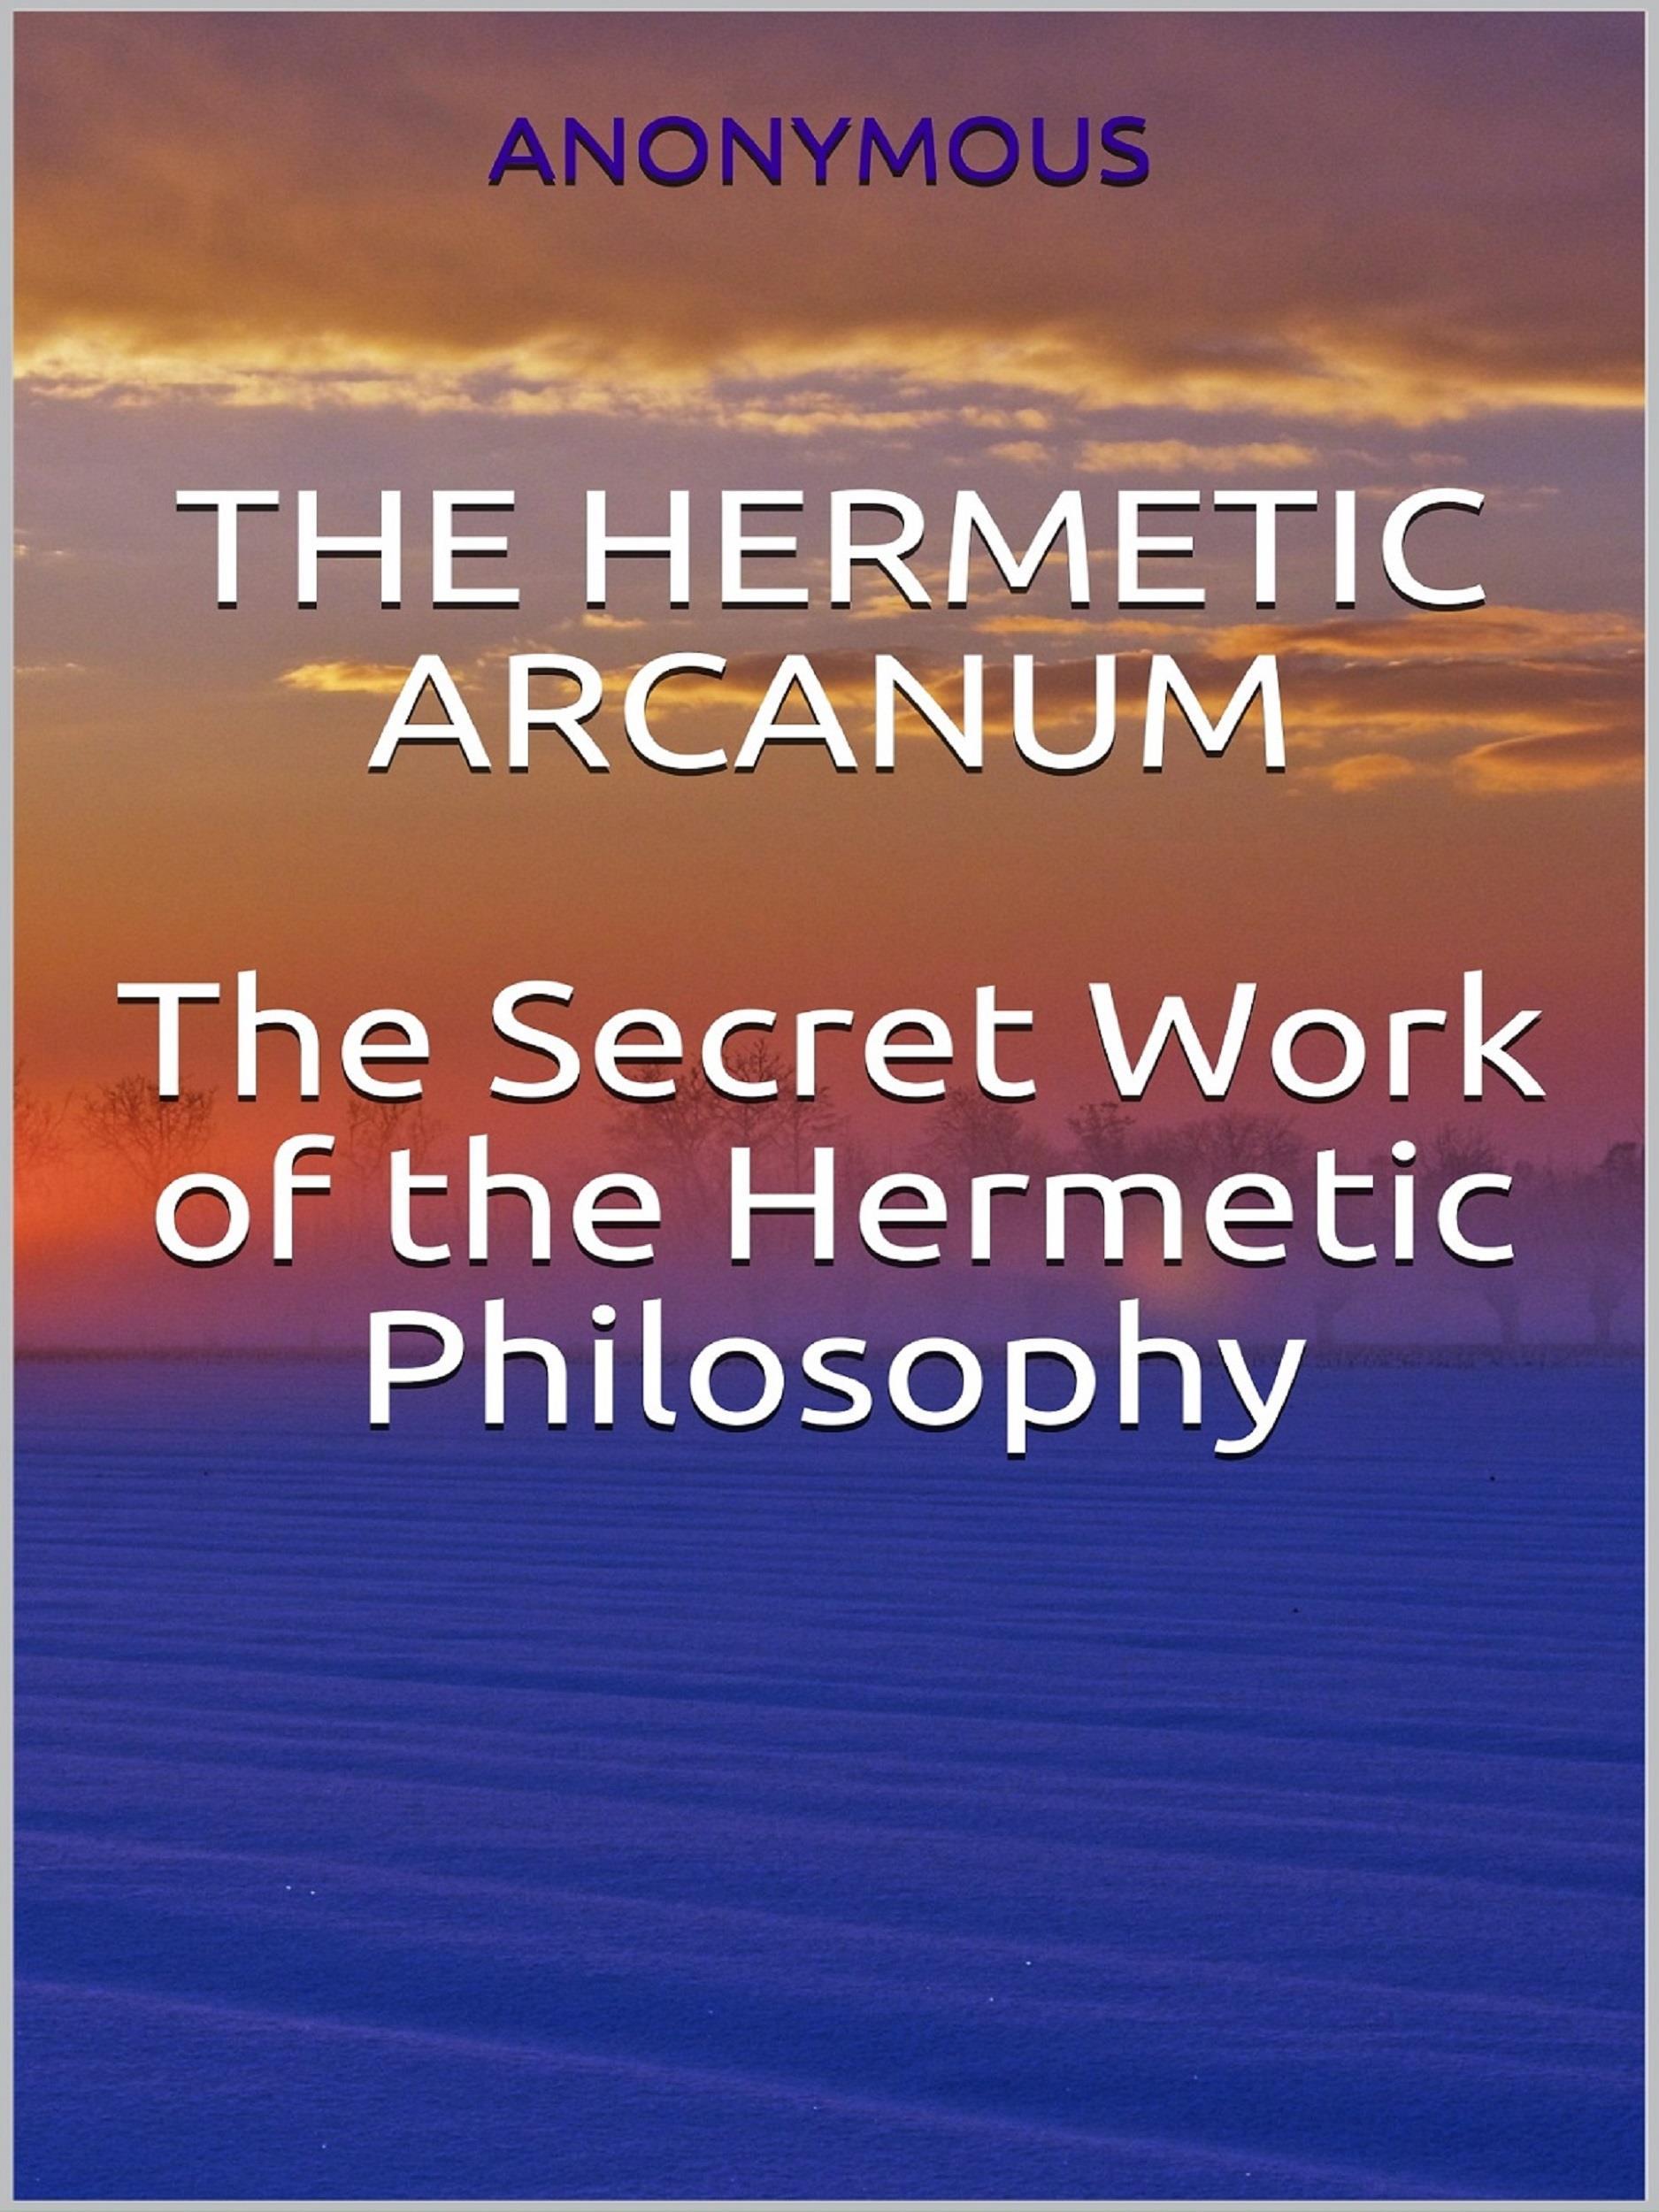 The Hermetic Arcanum - The secret work of the hermetic philosophy